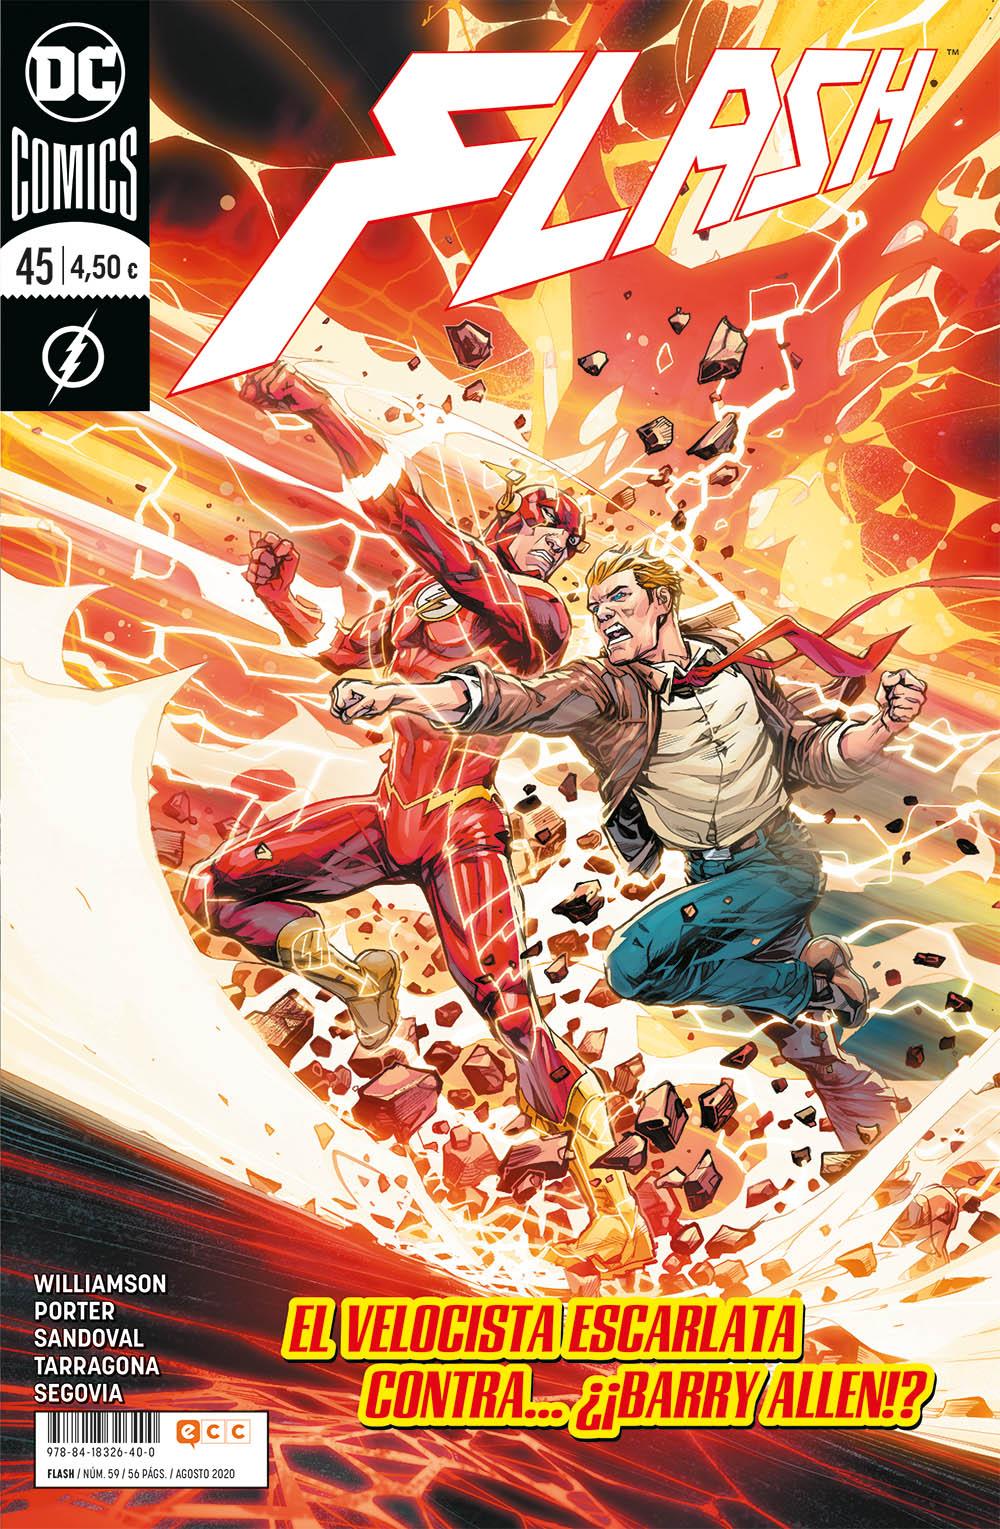 Flash #59 / 45